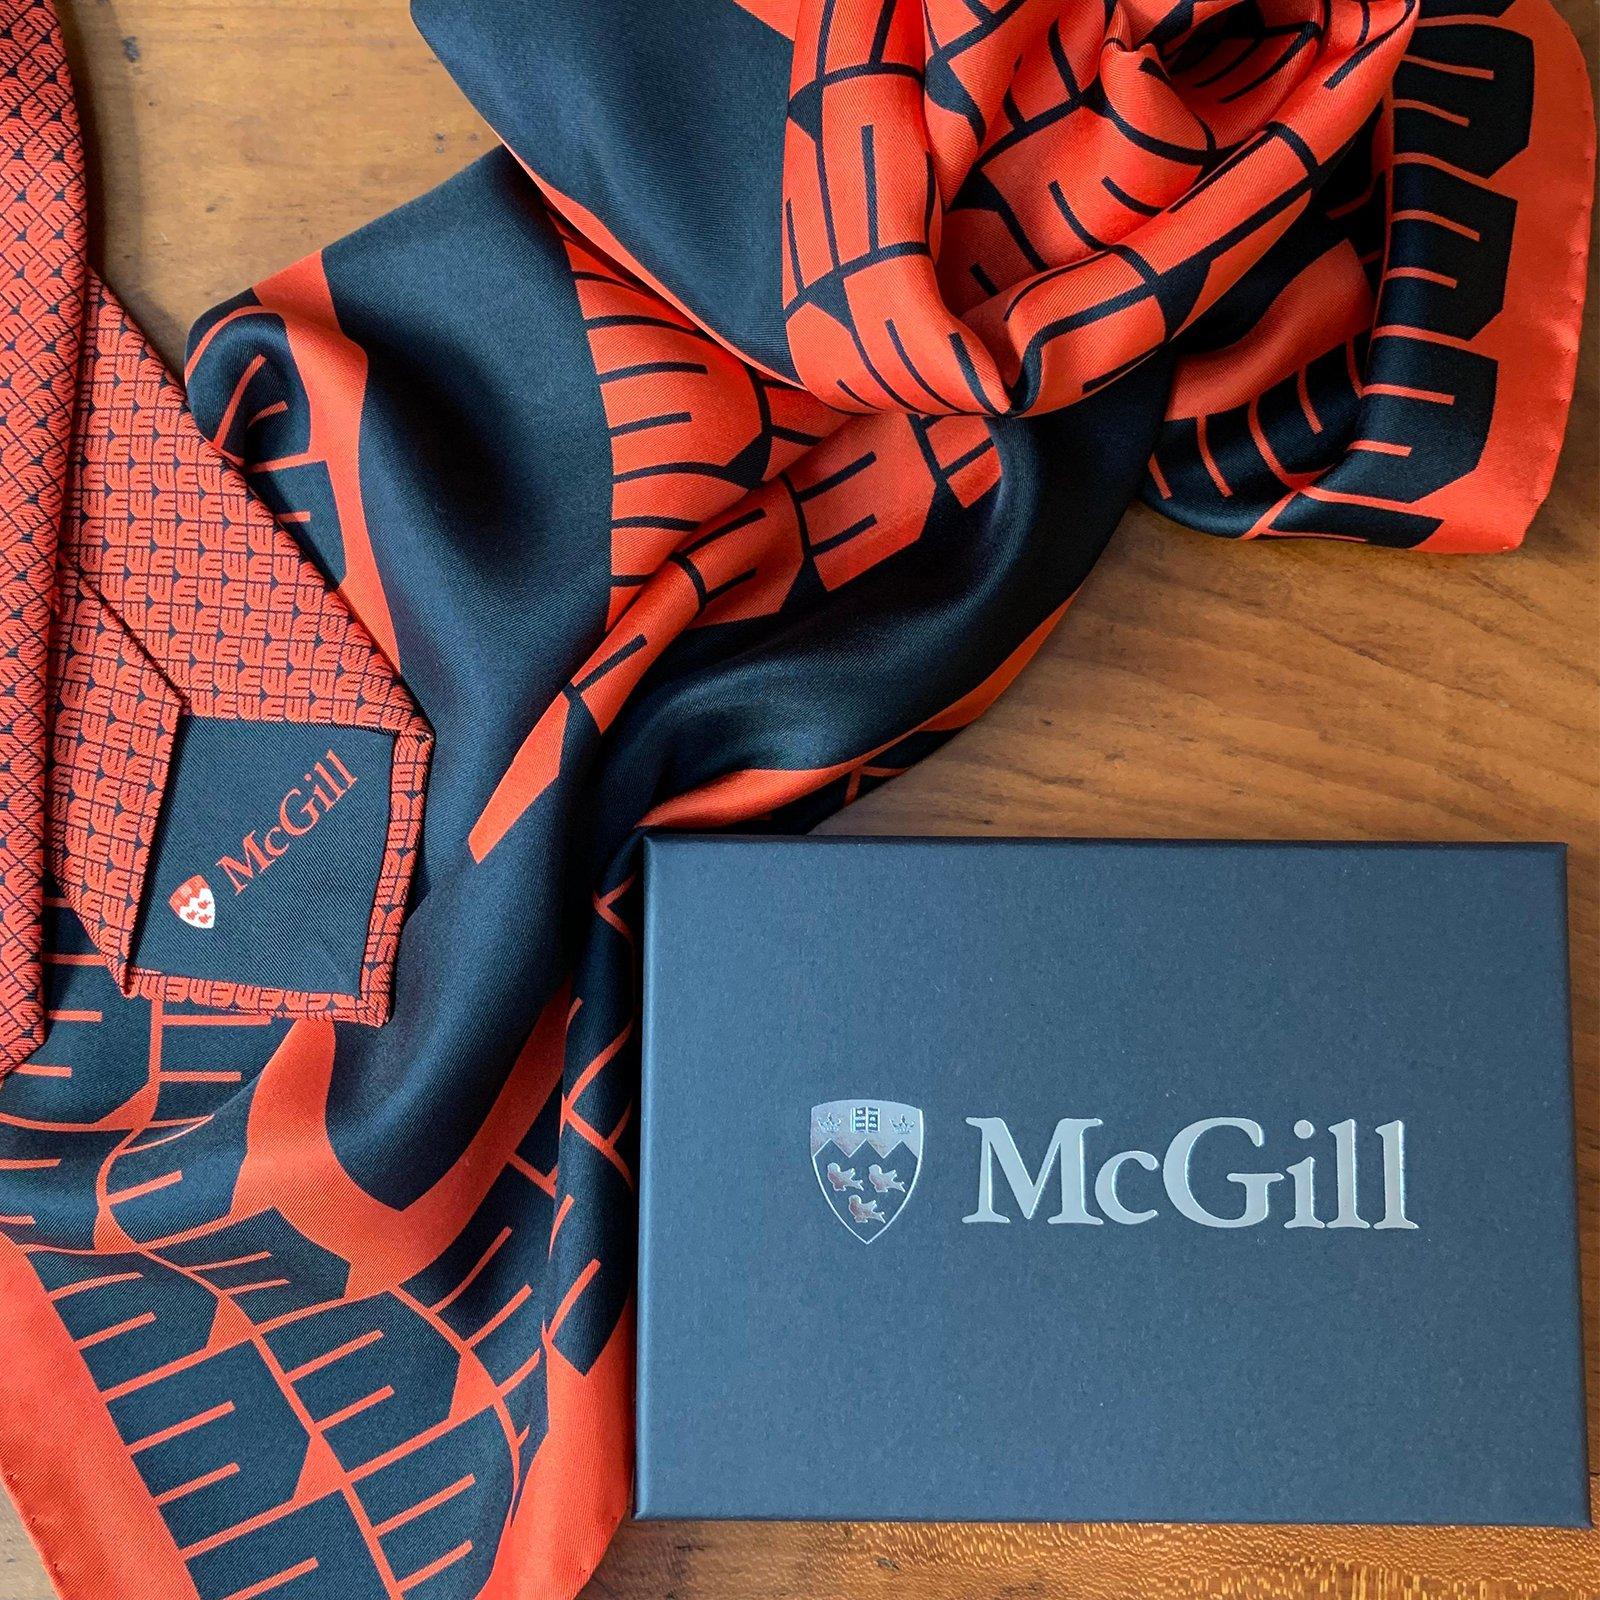 McGill_2